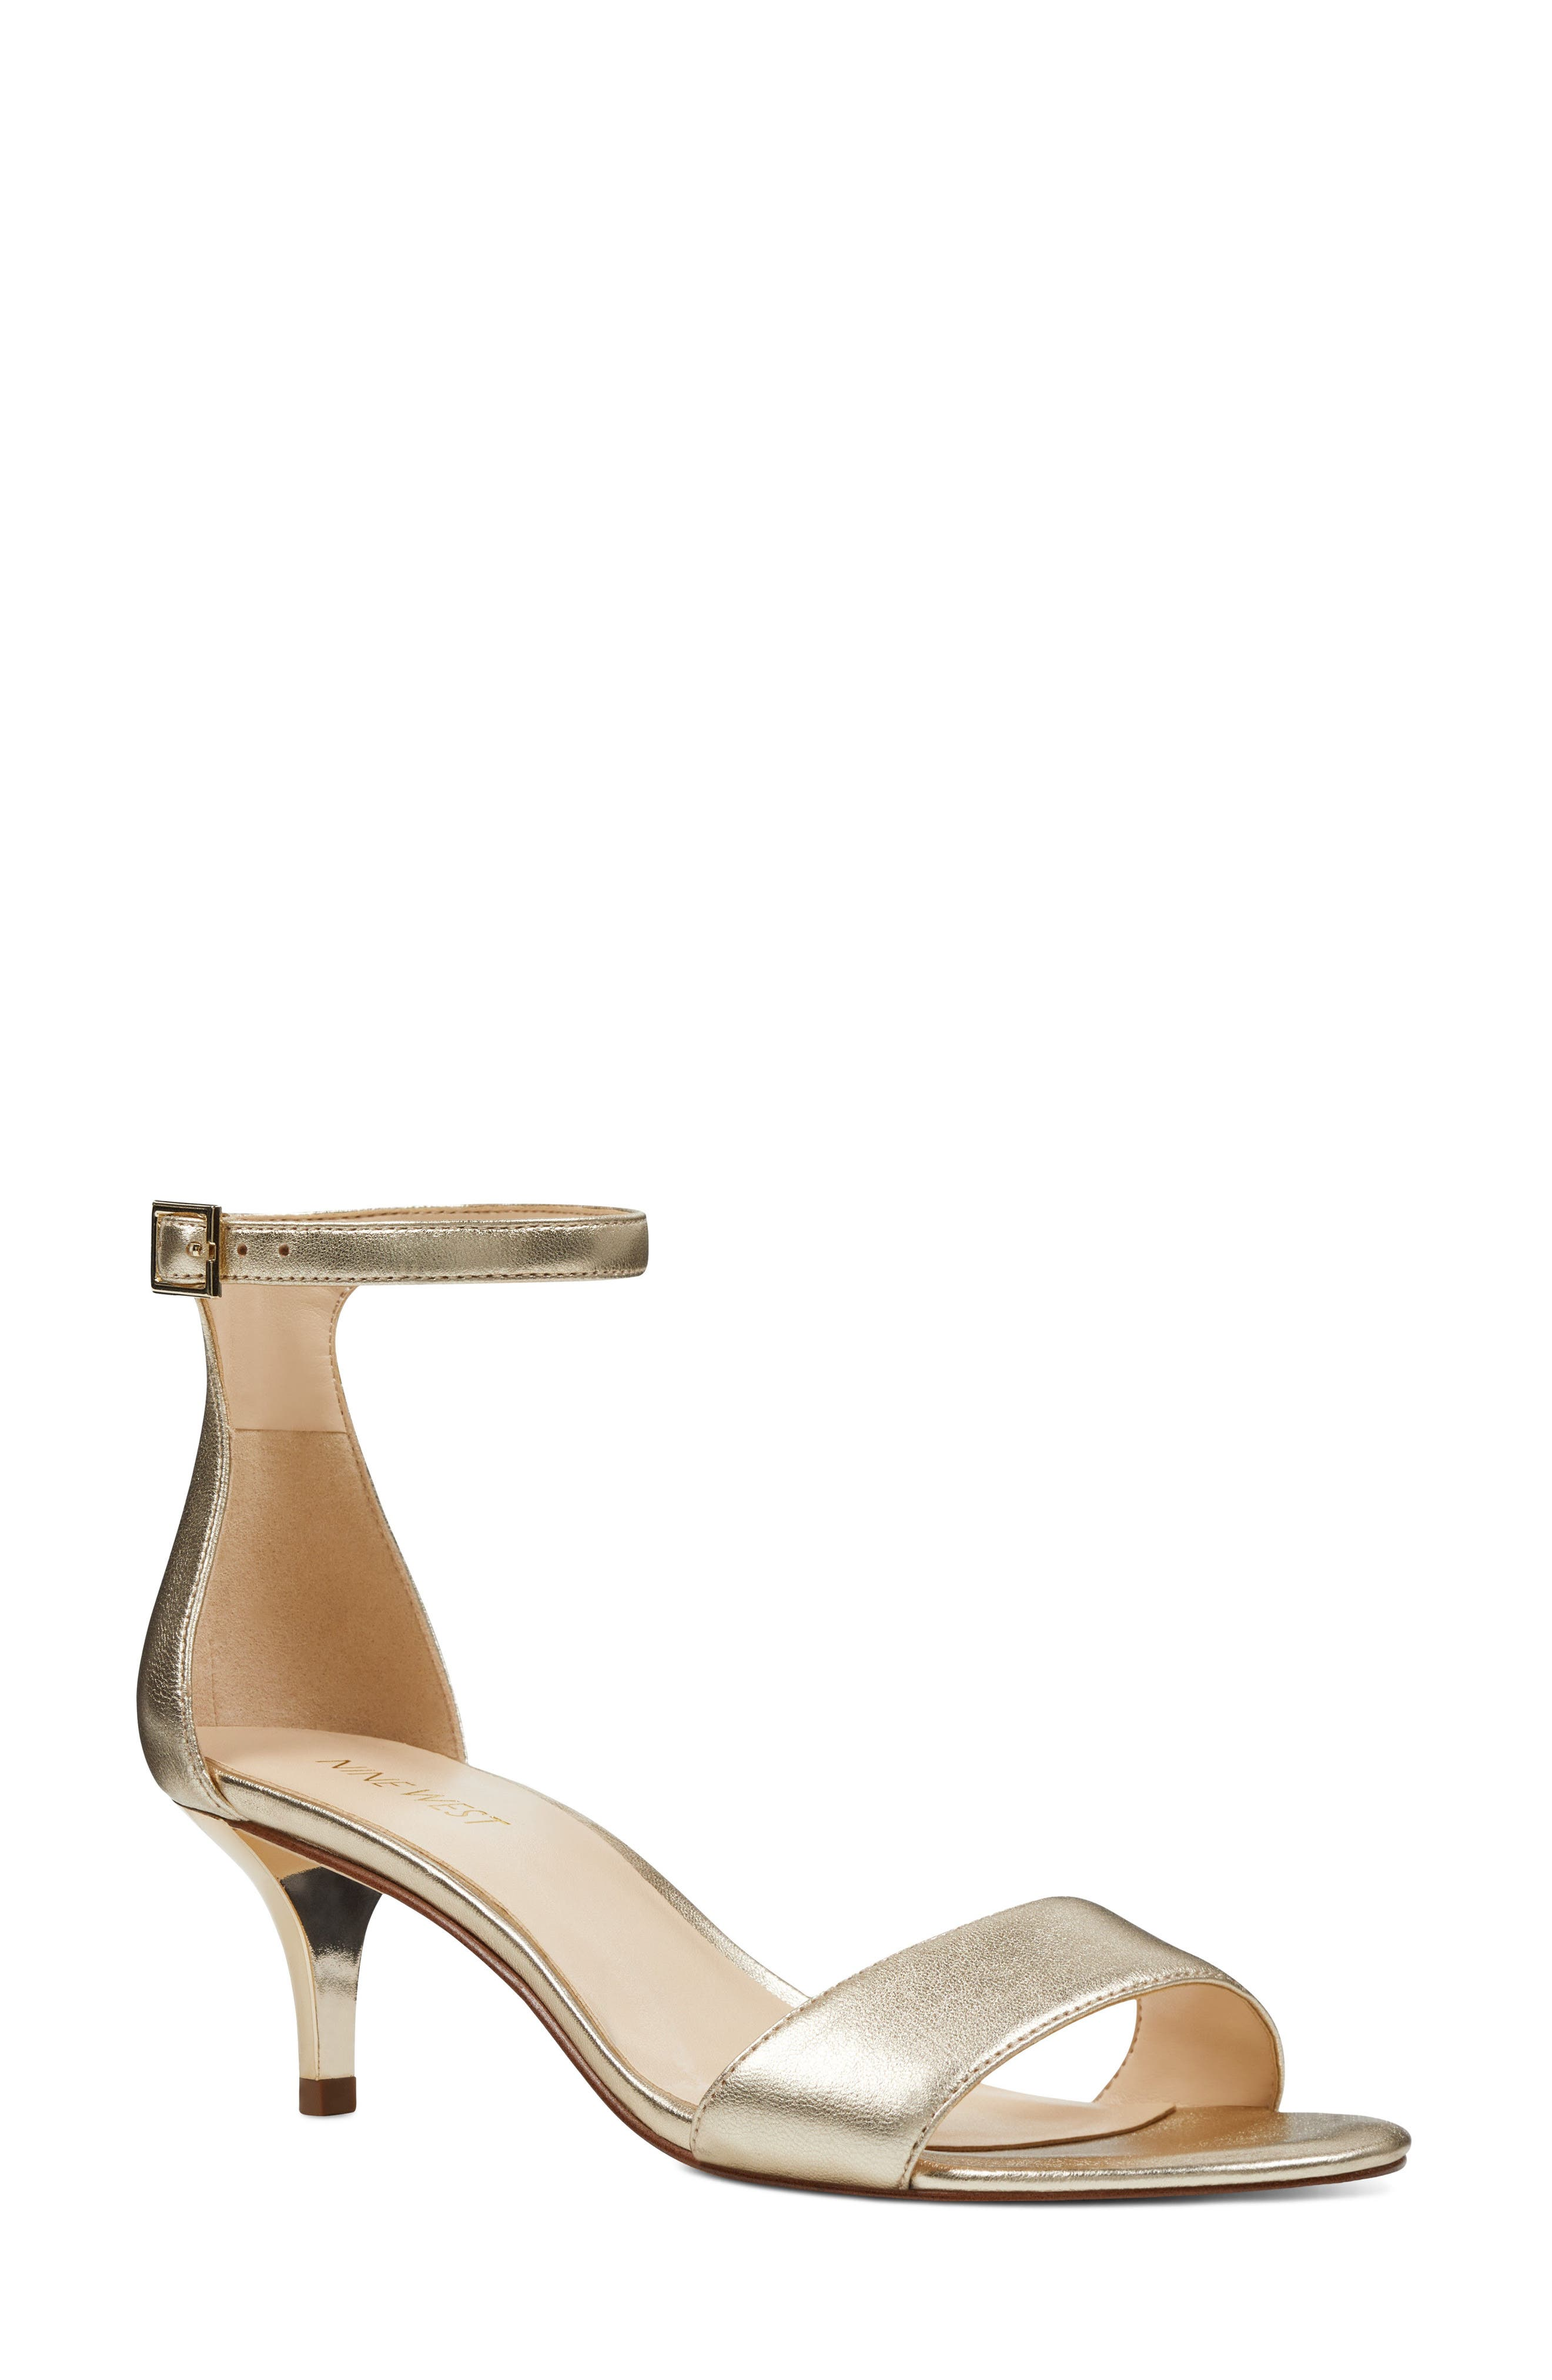 Main Image - Nine West 'Leisa' Ankle Strap Sandal (Women)